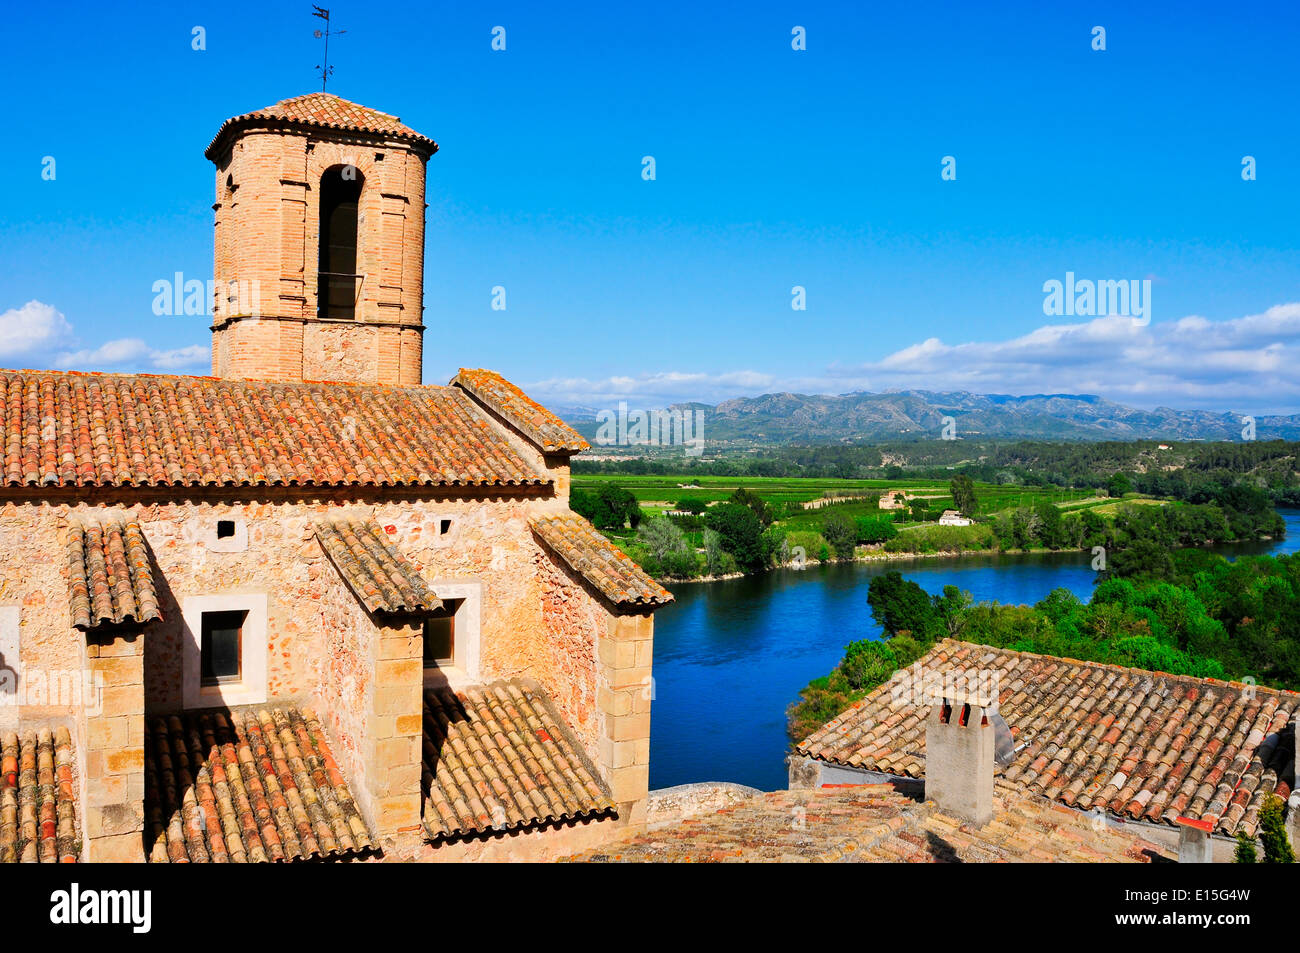 Esglesia Vella Church and Ebro River in Miravet, Spain with the Serra de Cardo mountain range in the background - Stock Image